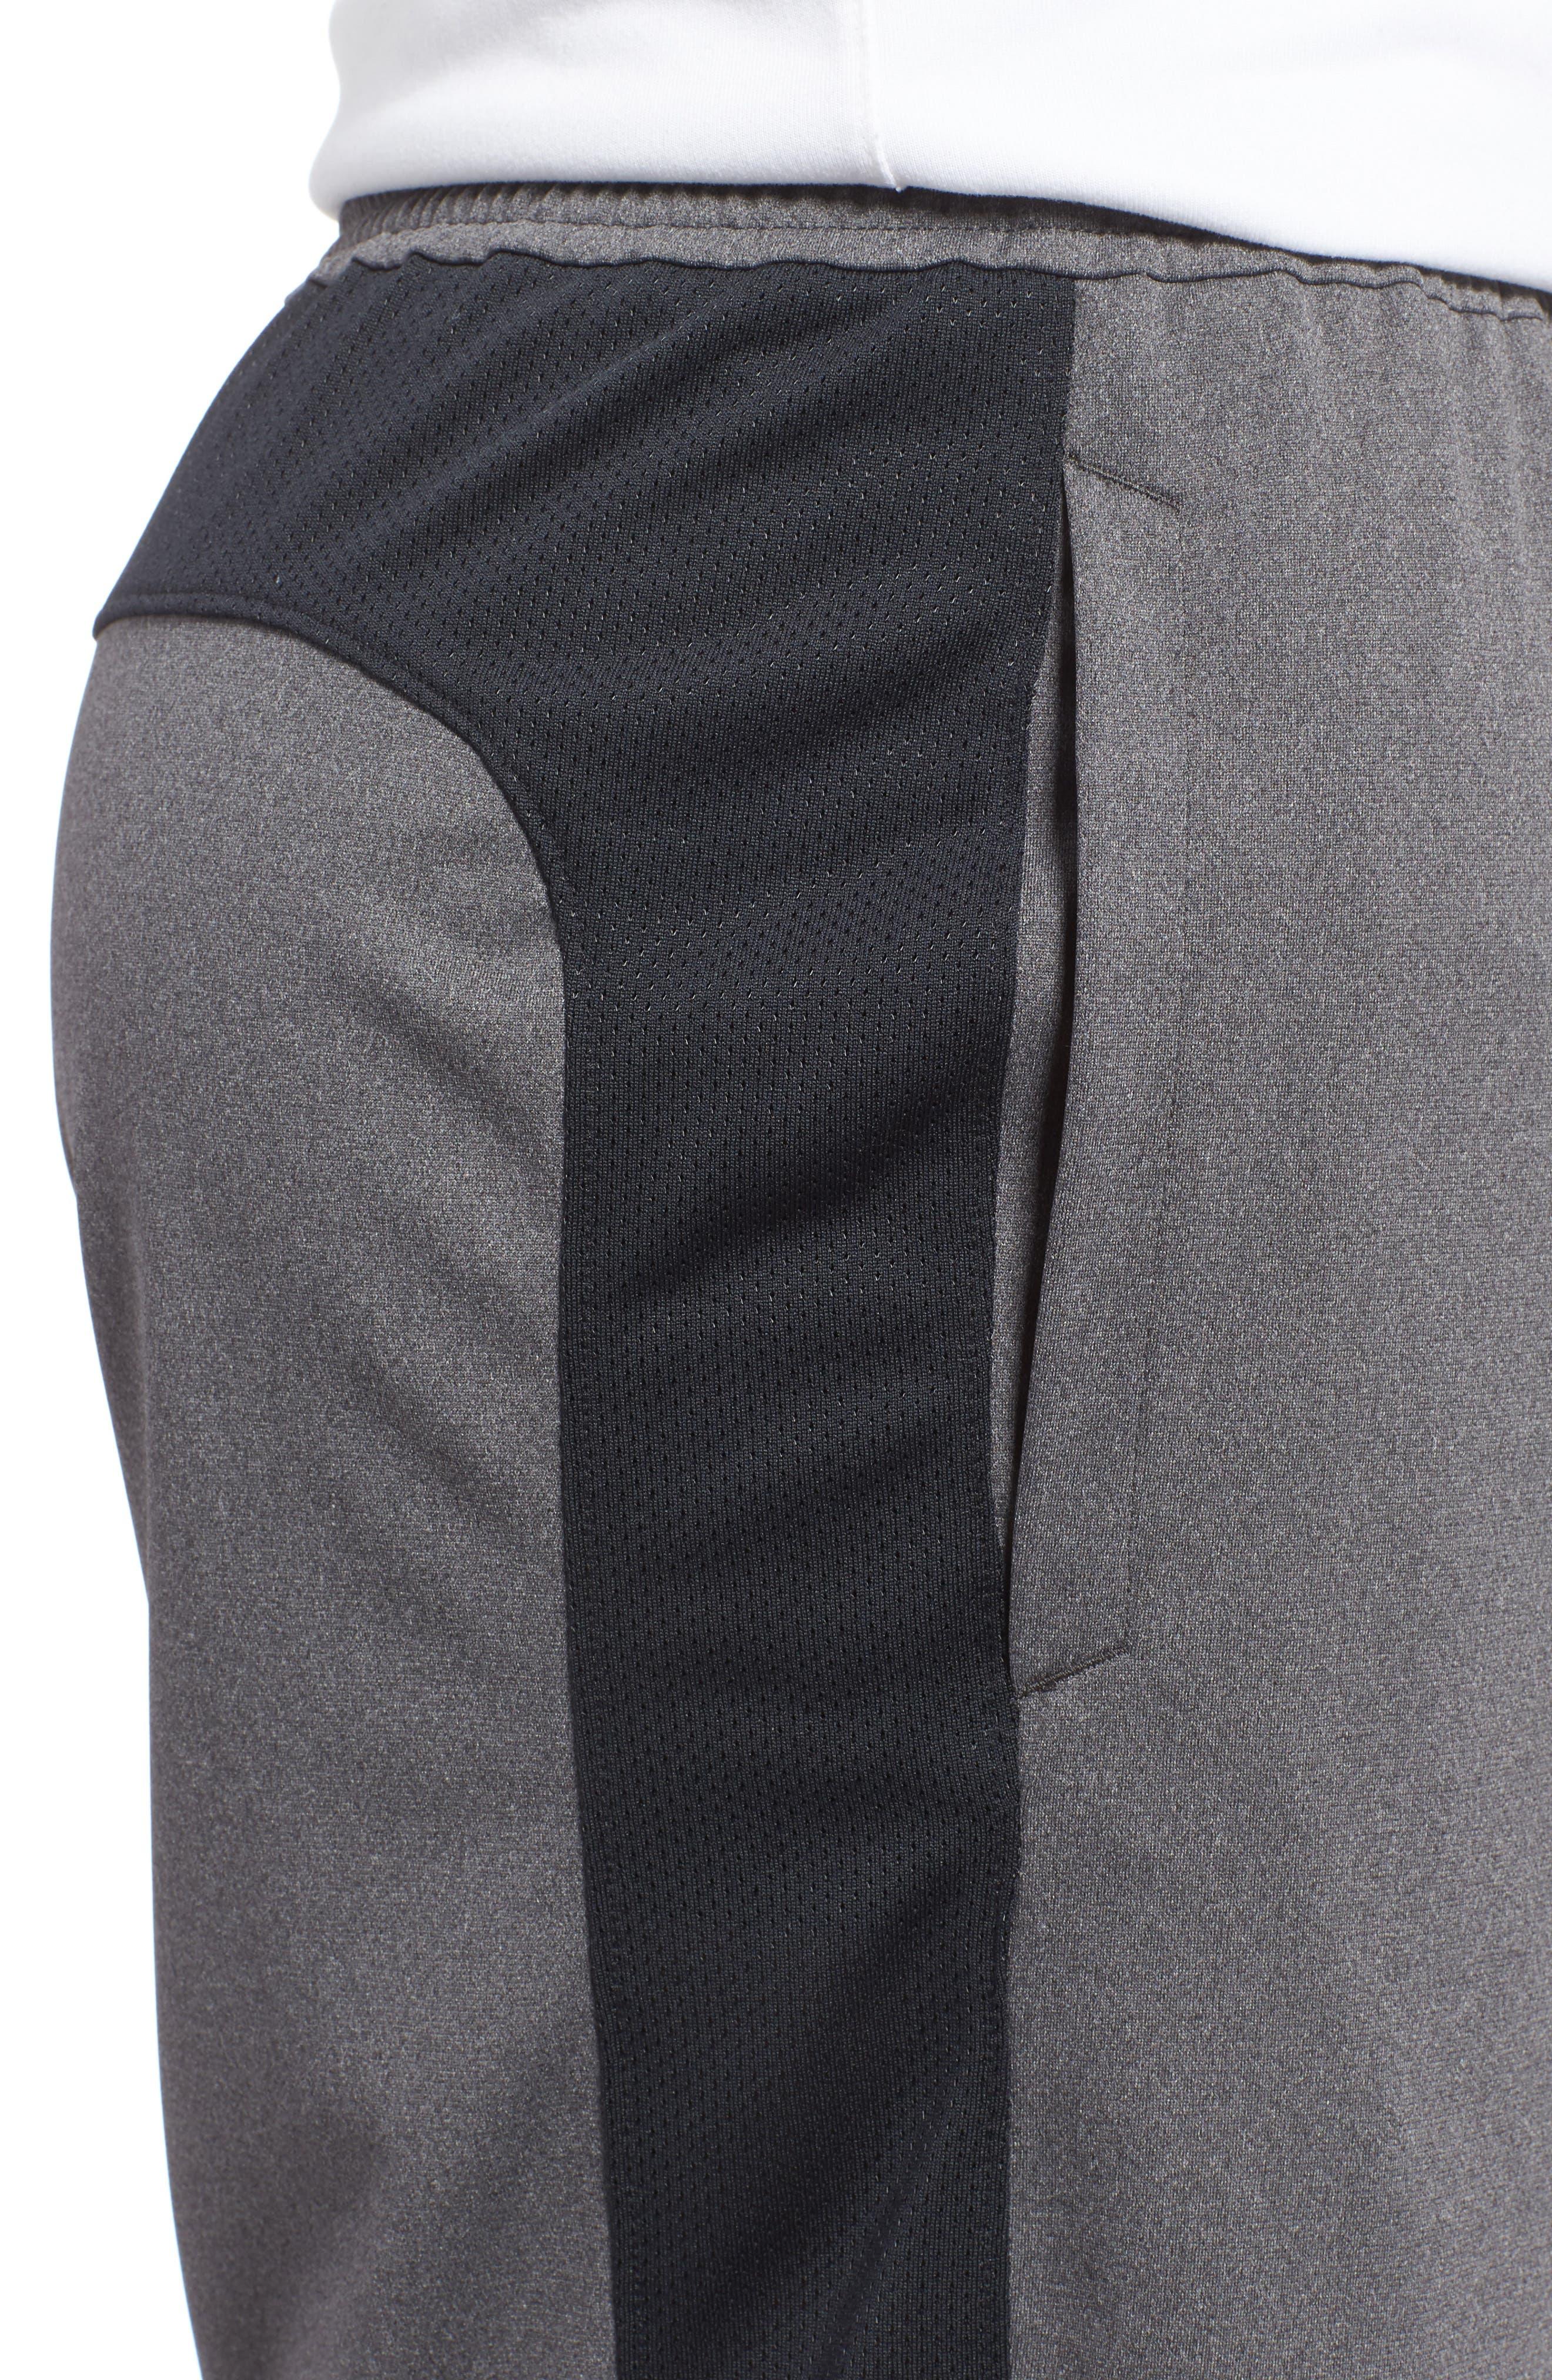 Alternate Image 4  - Under Armour Raid 2.0 Classic Fit Shorts